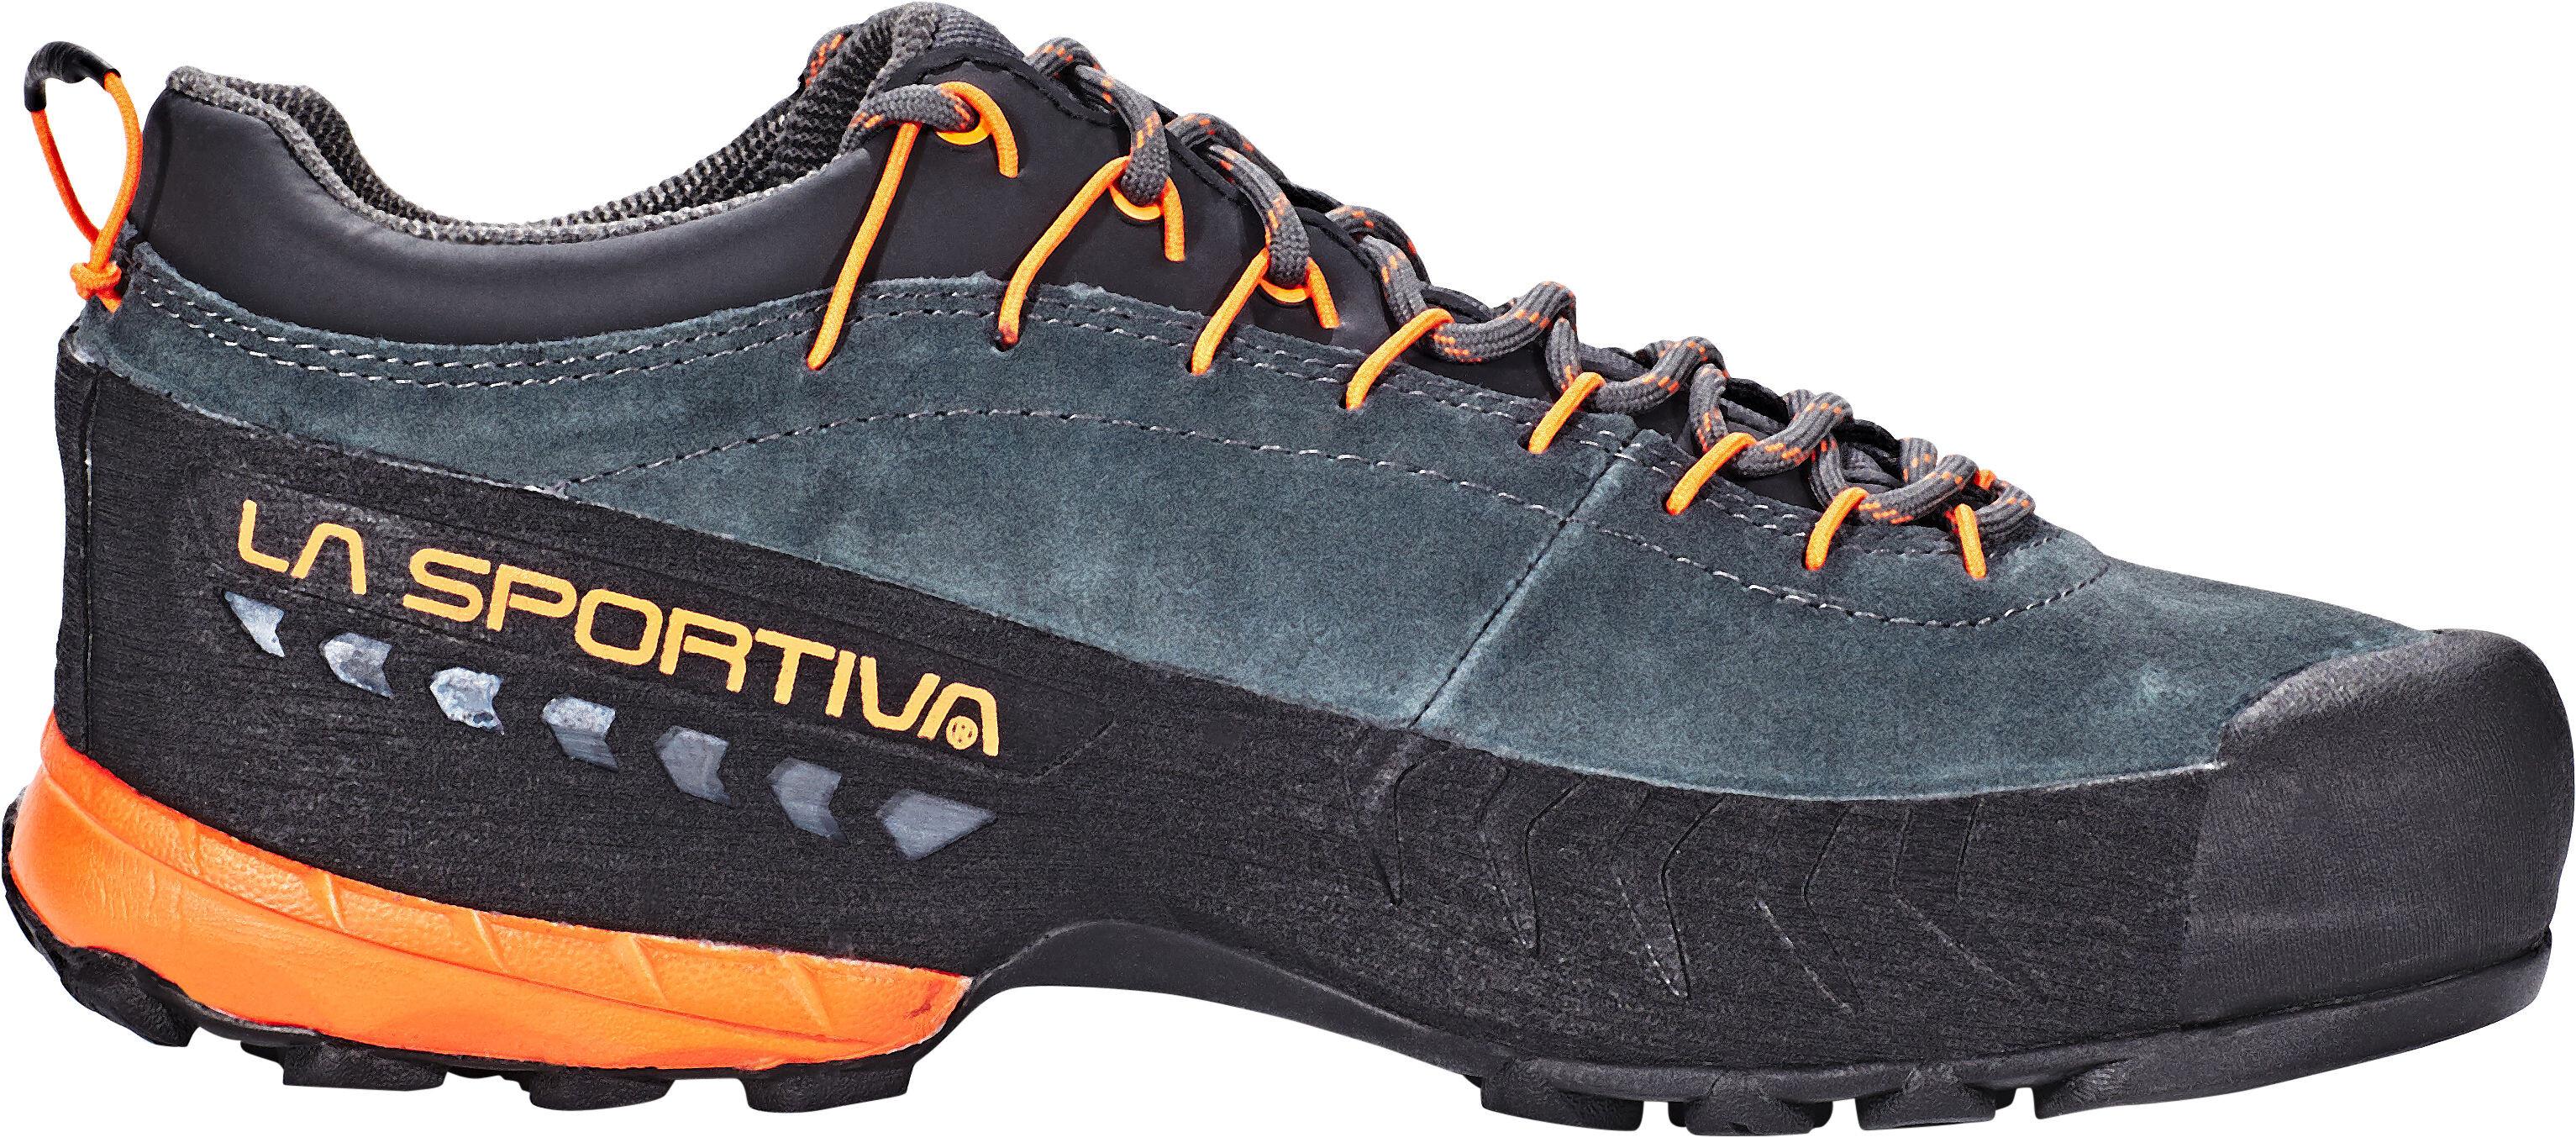 La Sportiva TX4 GTX - Calzado Hombre - gris naranja  e3d3607e7b26